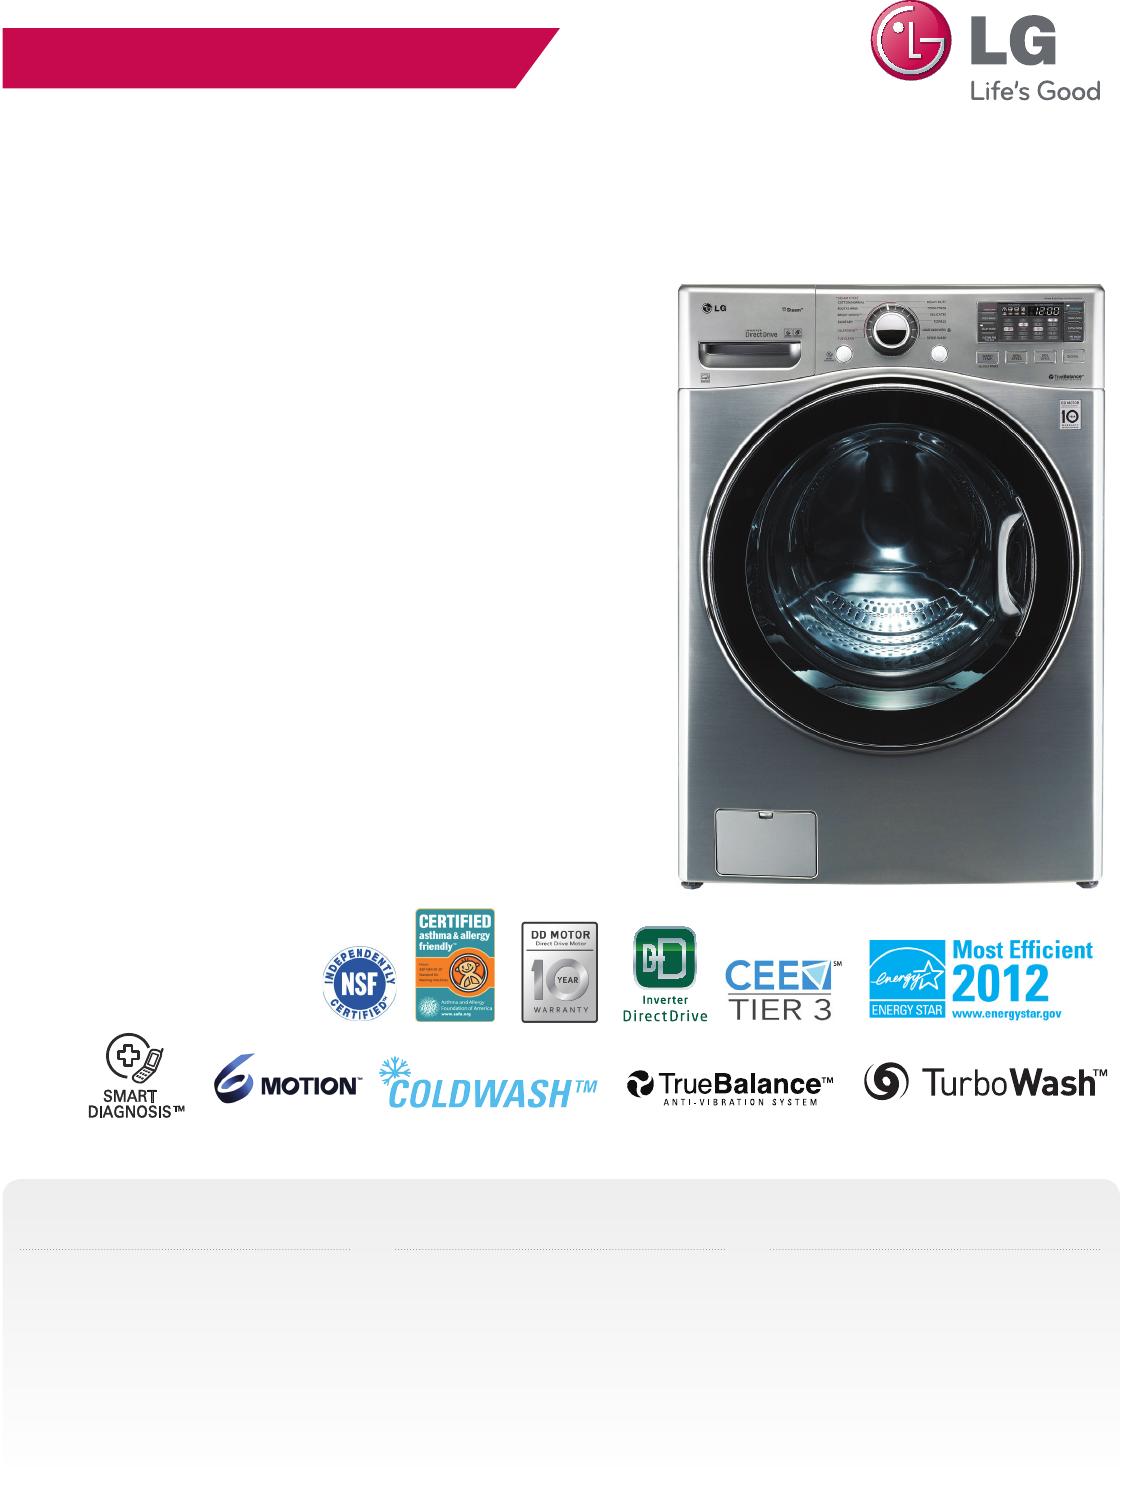 lg wm3470hwa user manual specification wm3470 washer spec sheet rh usermanual wiki LG Washer and Dryer Sets lg washer wm3470hwa manual